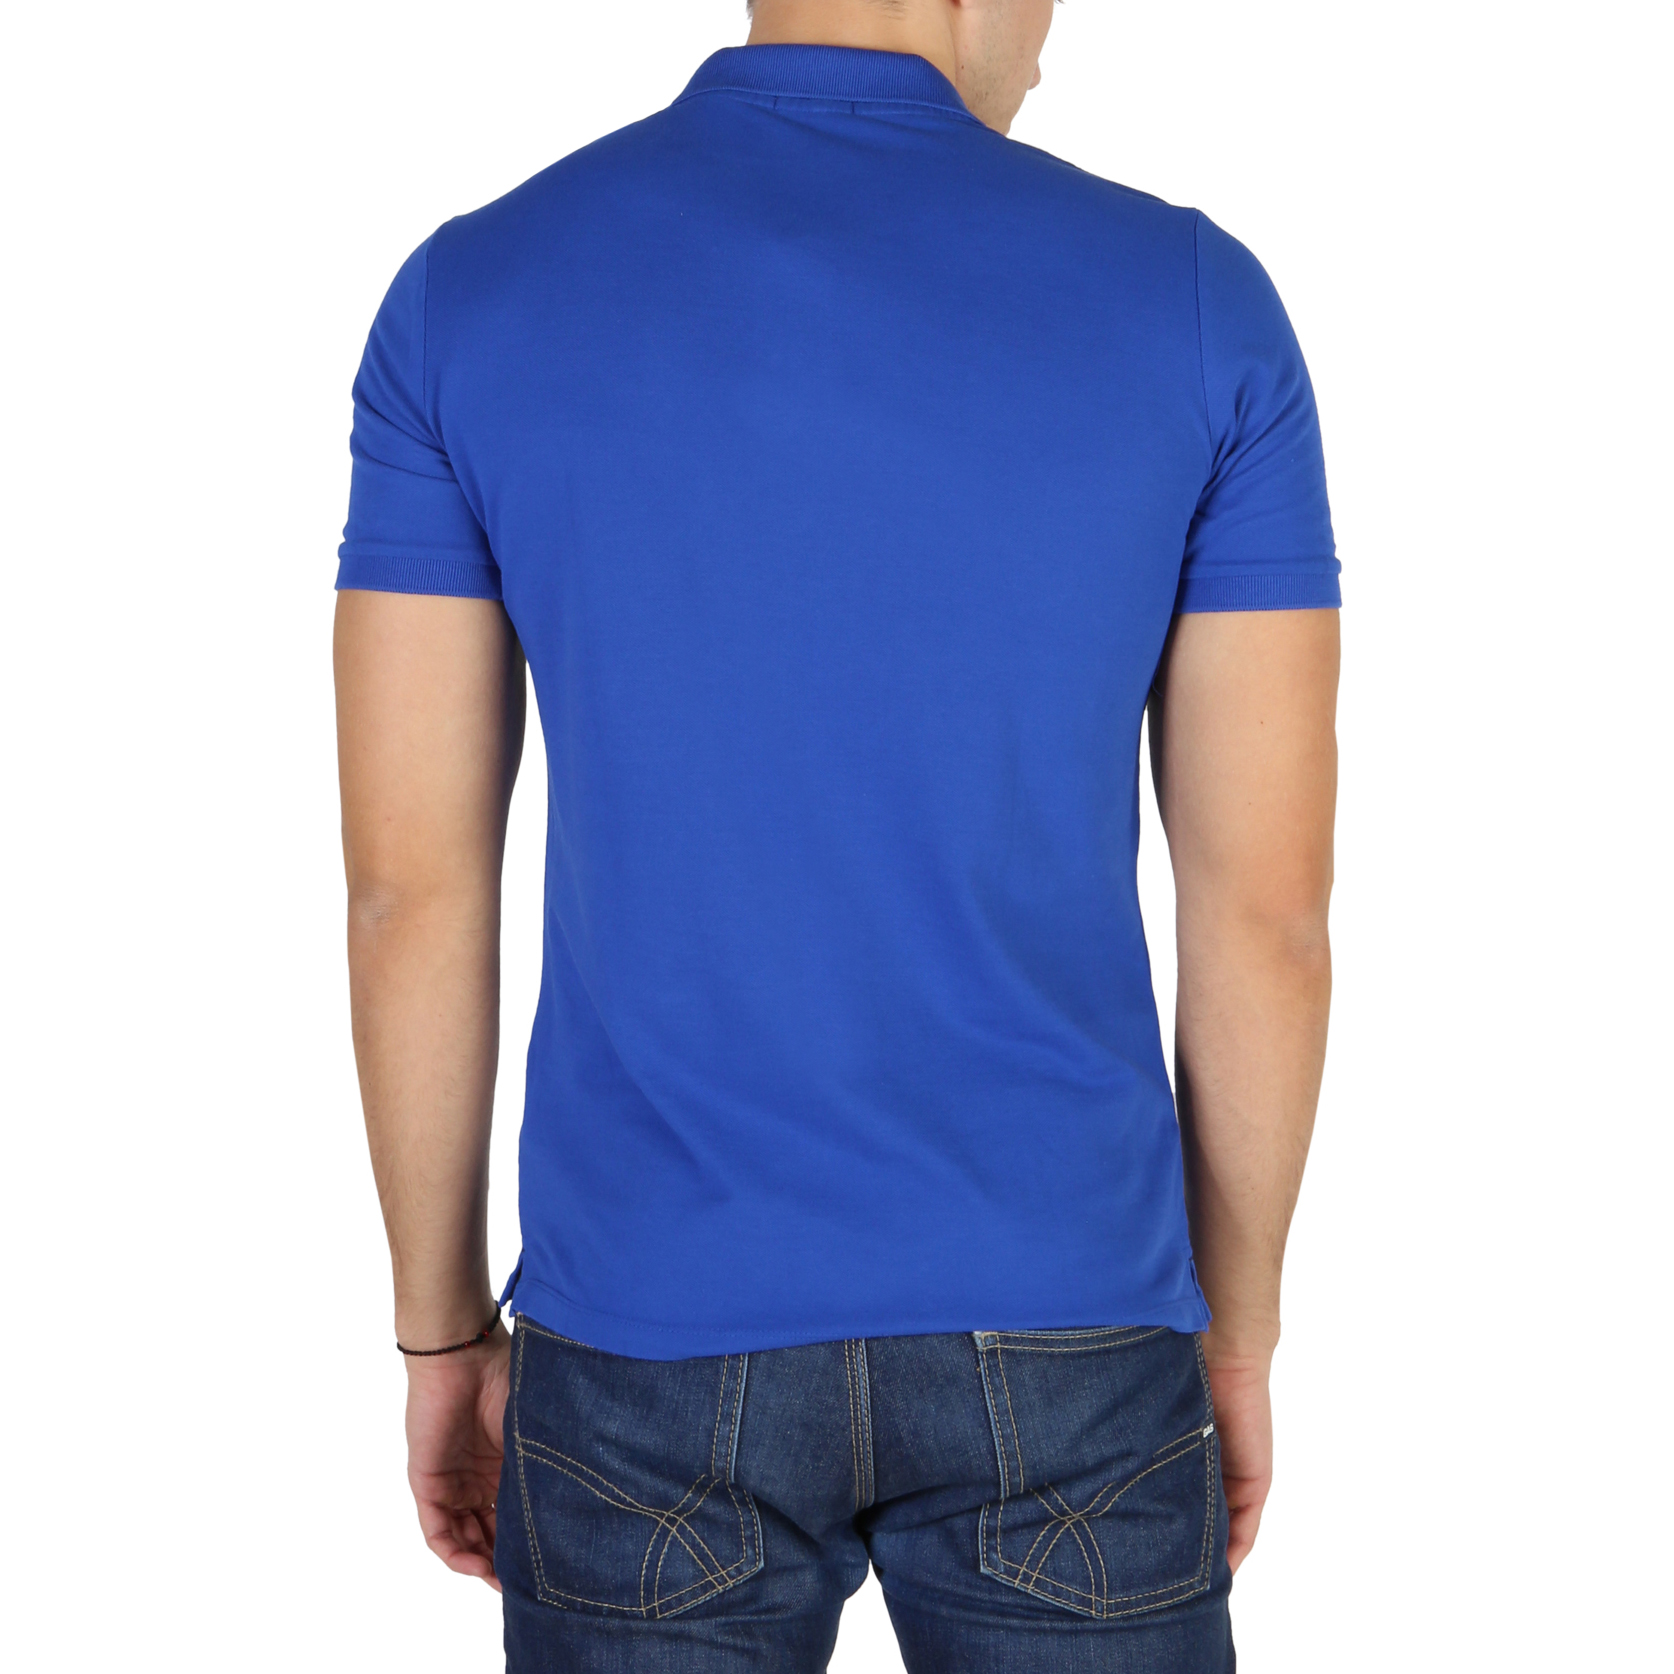 Polo-Calvin-Klein-J3EJ303832-Uomo-Blu-104158-Abbigliamento-Uomo-Calvin-Klein miniatura 2